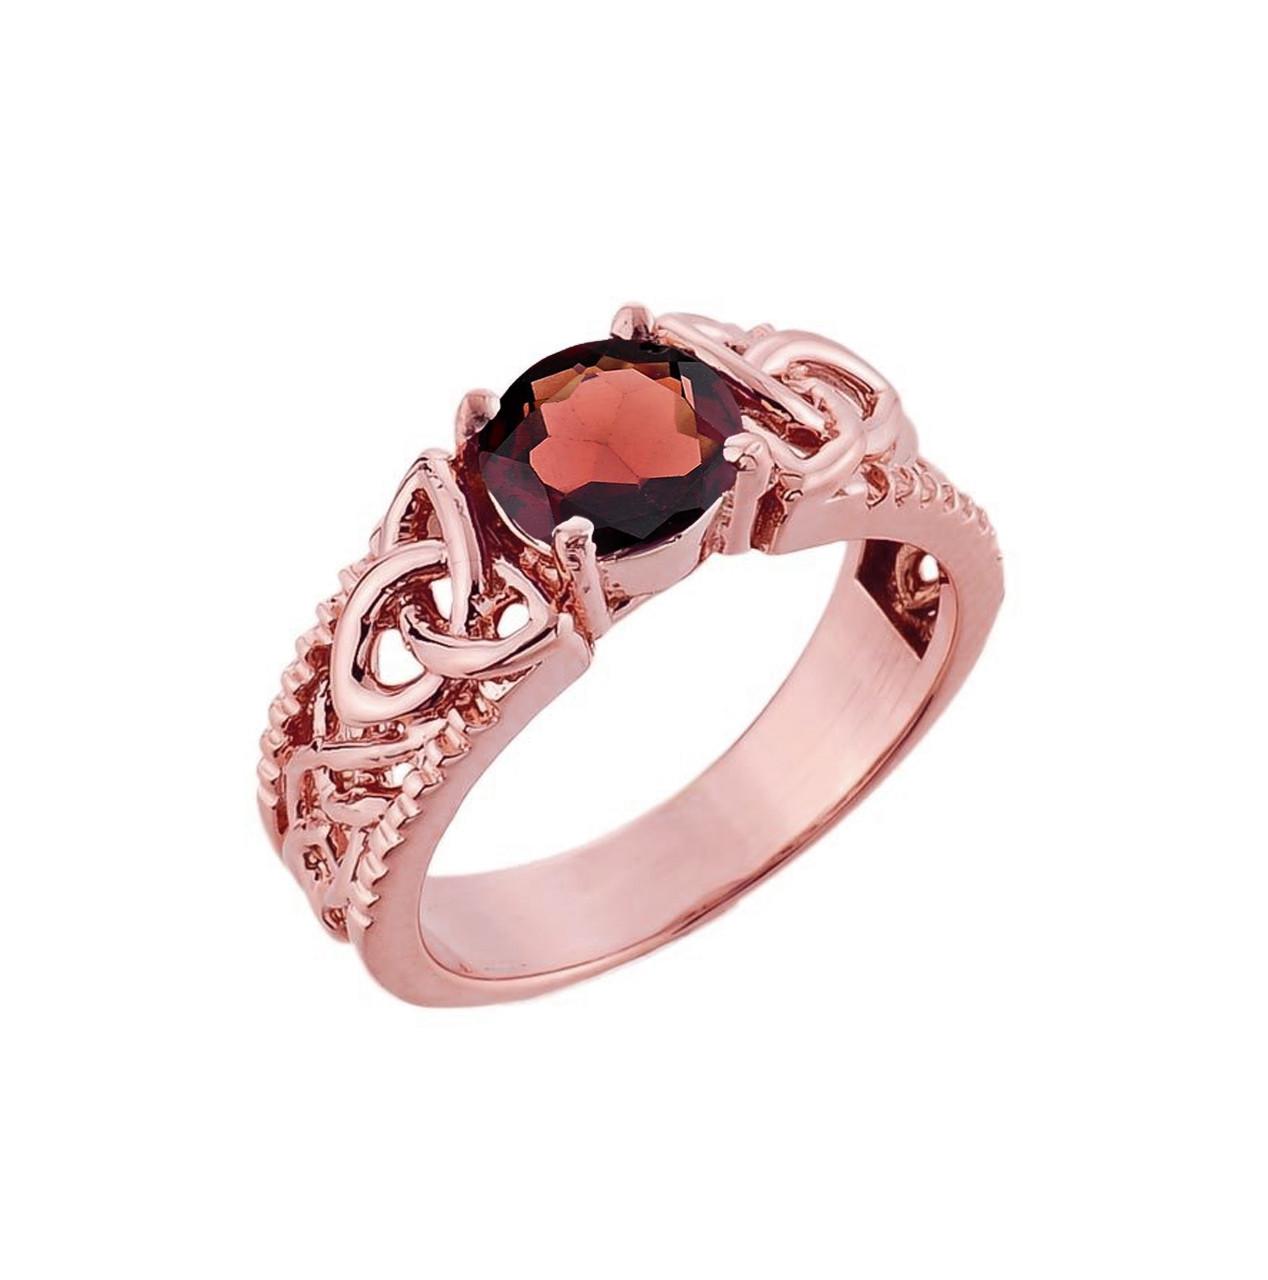 10K Rose Gold Celtic Knot Garnet Gemstone Ring January Birthstone ...